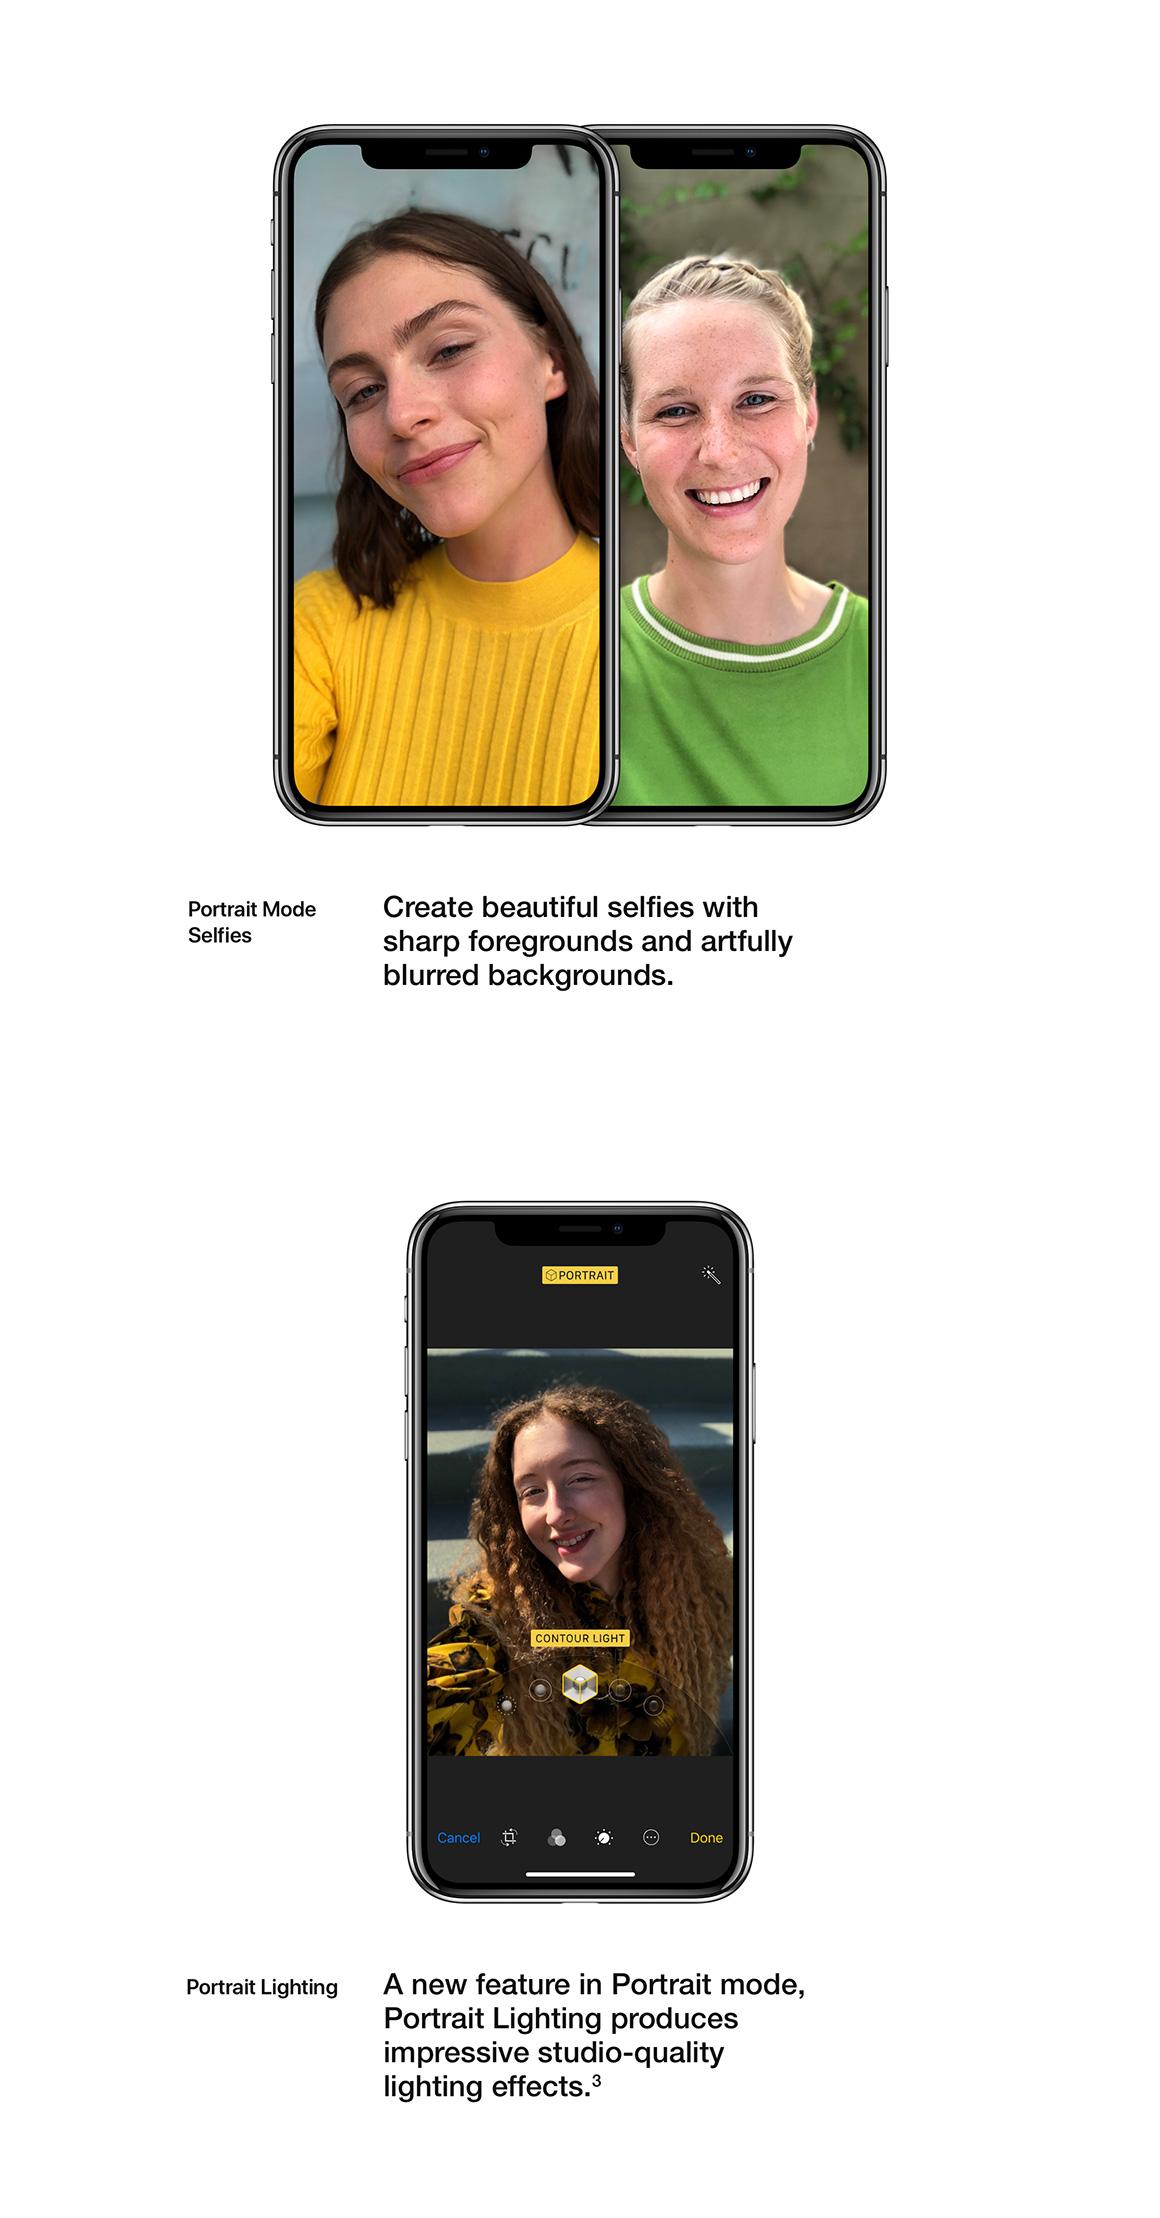 Portrait Mode Selfies